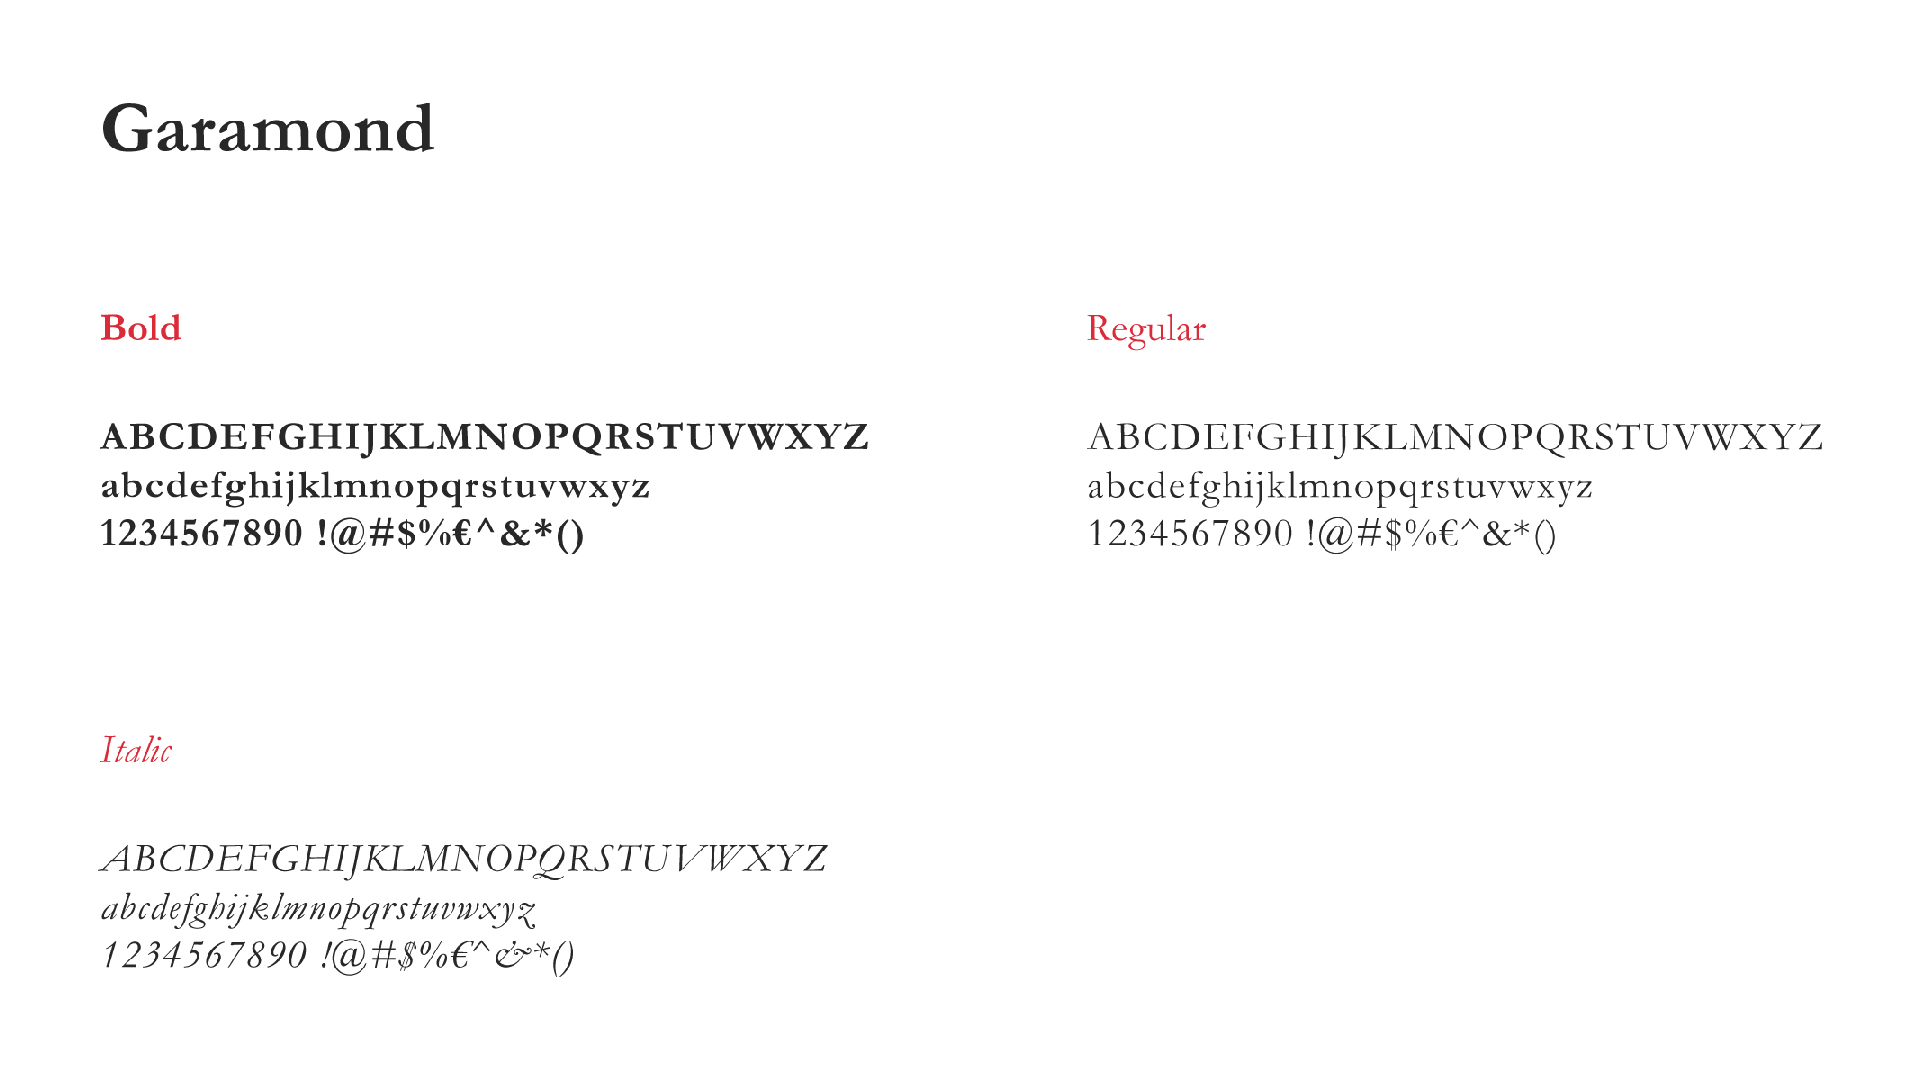 FAGQ font (Garamond)